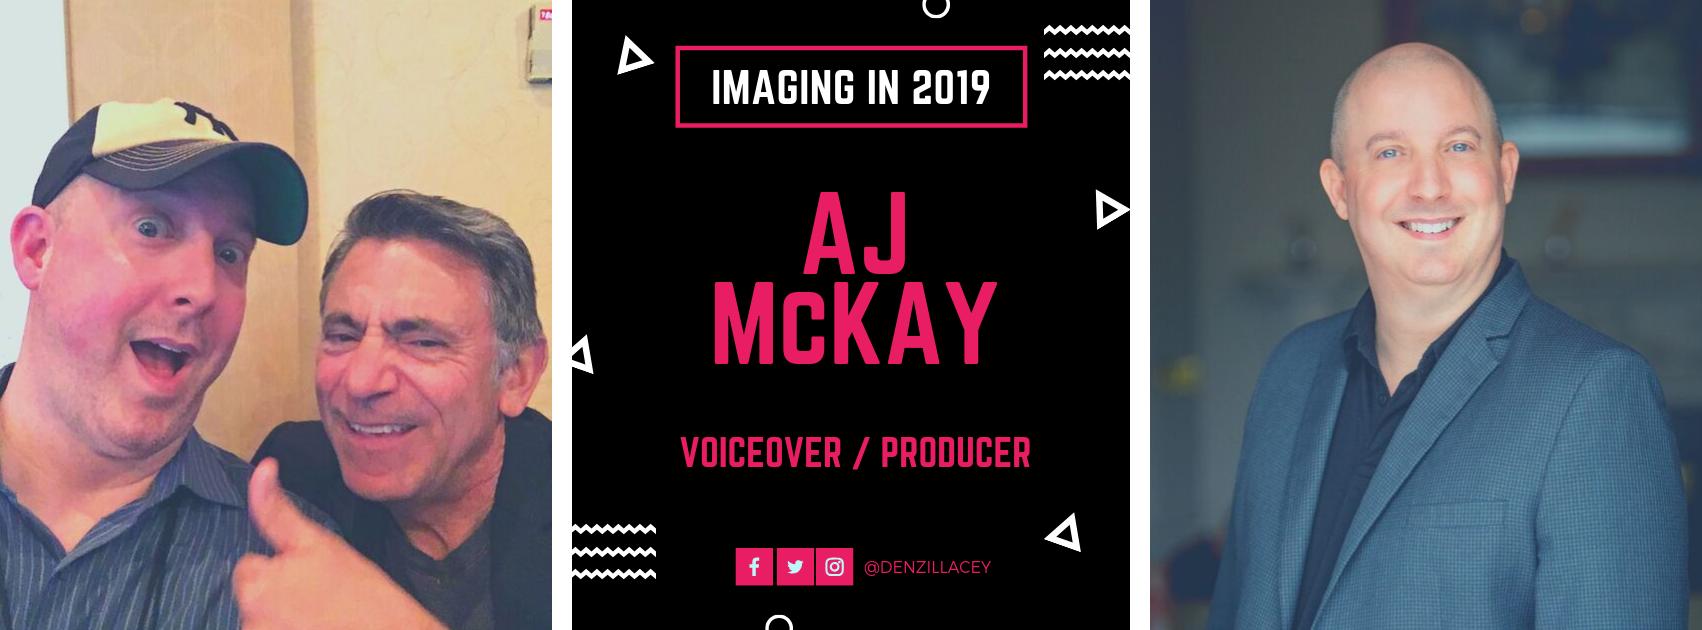 AJ McKay Voiceover